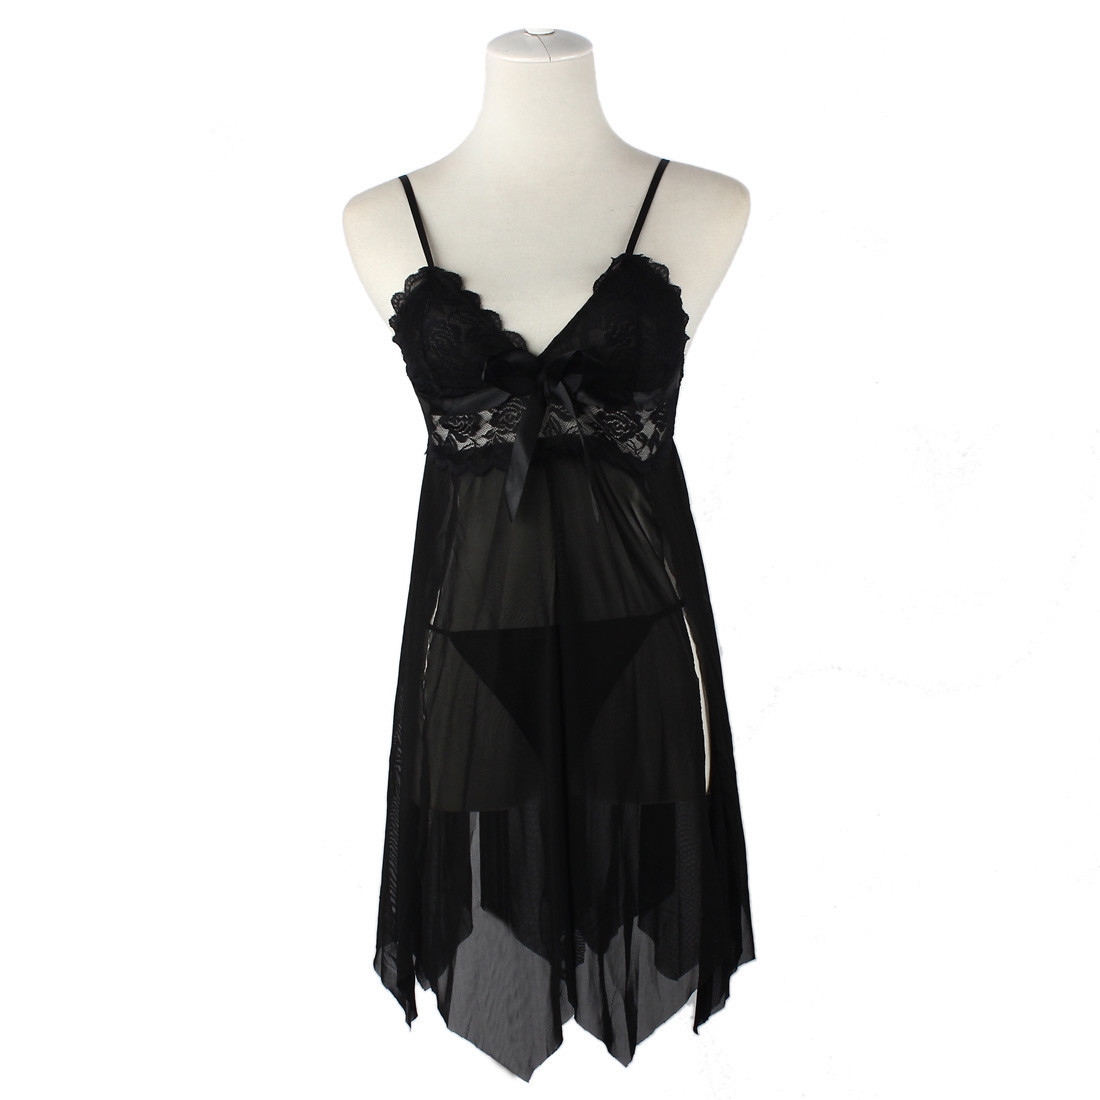 Exotic Apparel Sexy Lingerie Women's Underwear Babydoll Sleepwear Lace Dress G-string Nightwear Lenceria Erotica Mujer Baby Doll